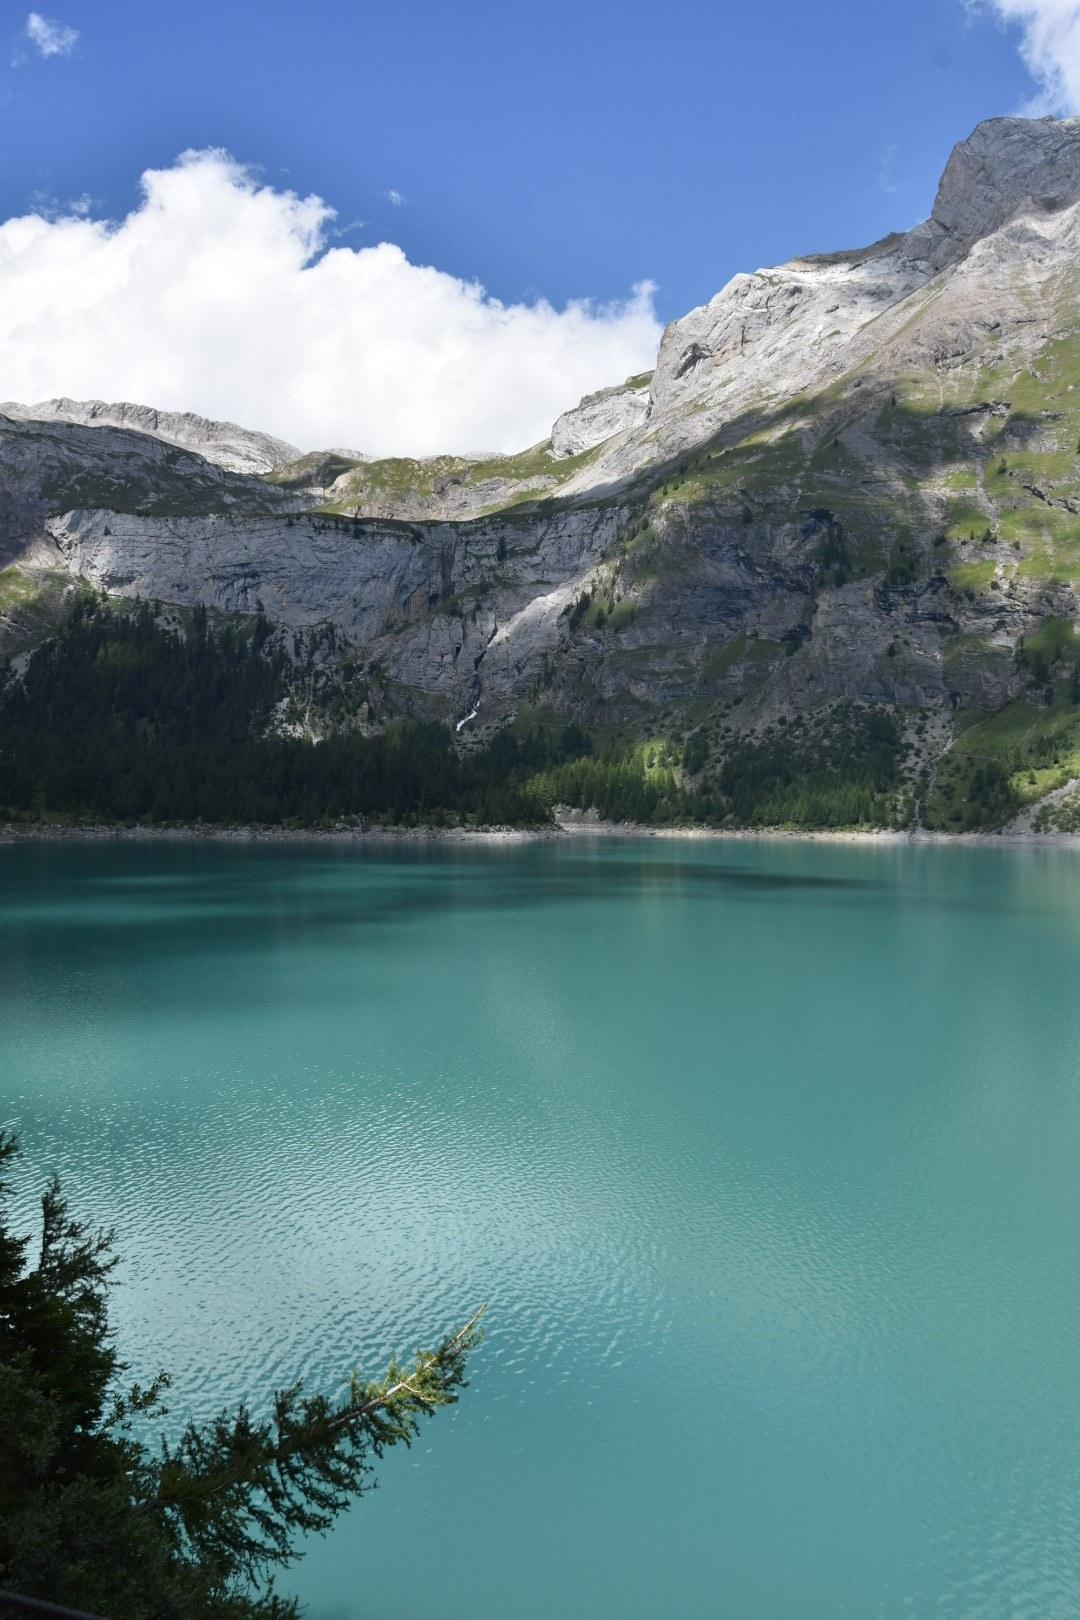 The Lac de Tseuzier